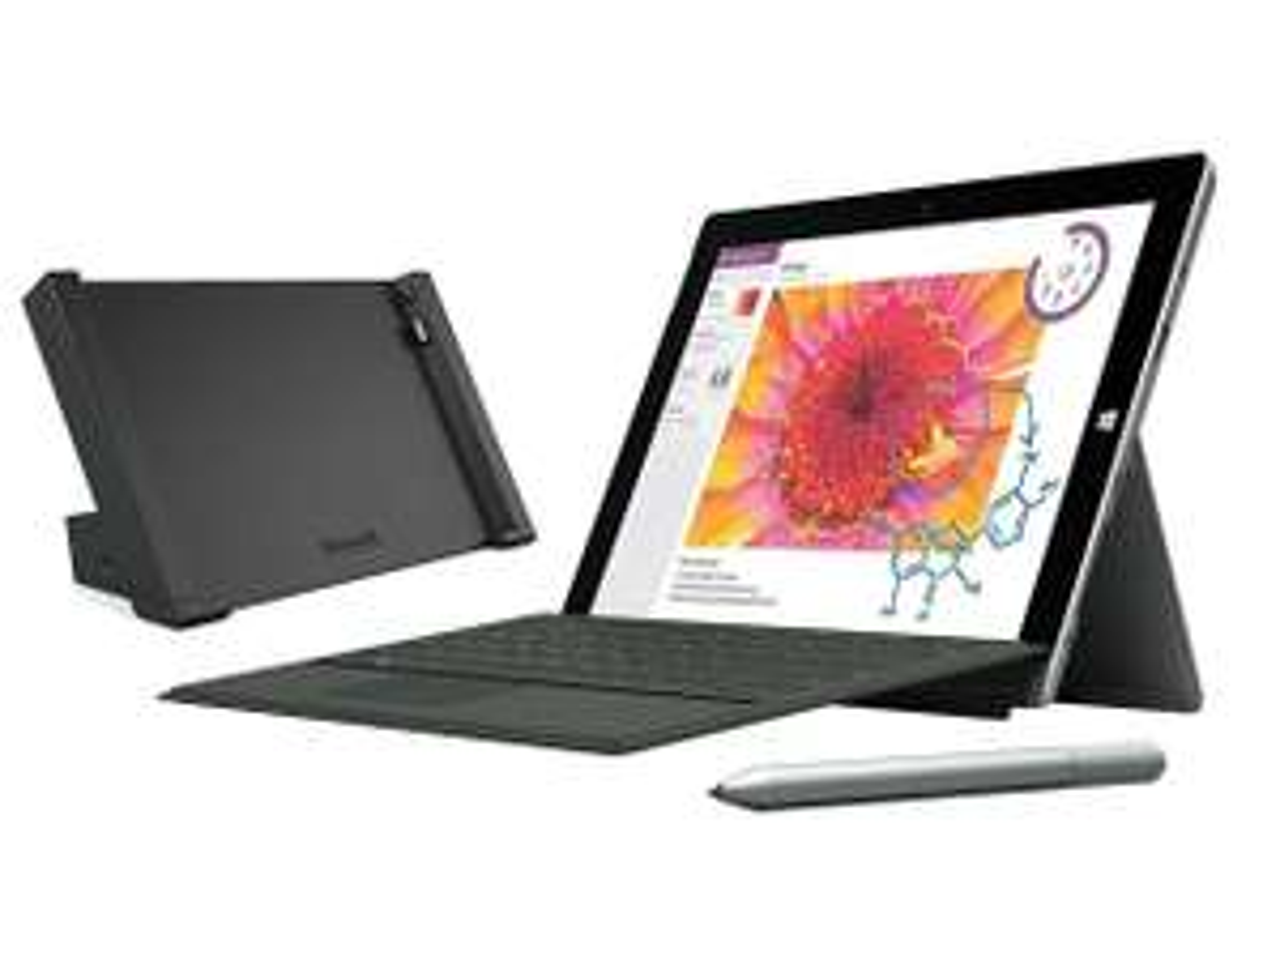 "Microsoft Surface 3 10.8"" 128GB + 4G Tablet, Docking Station, Keyboard & Pen (Seller Refurb-Grade B) £178.99@StockMustGo/eBay-£143 w/code"